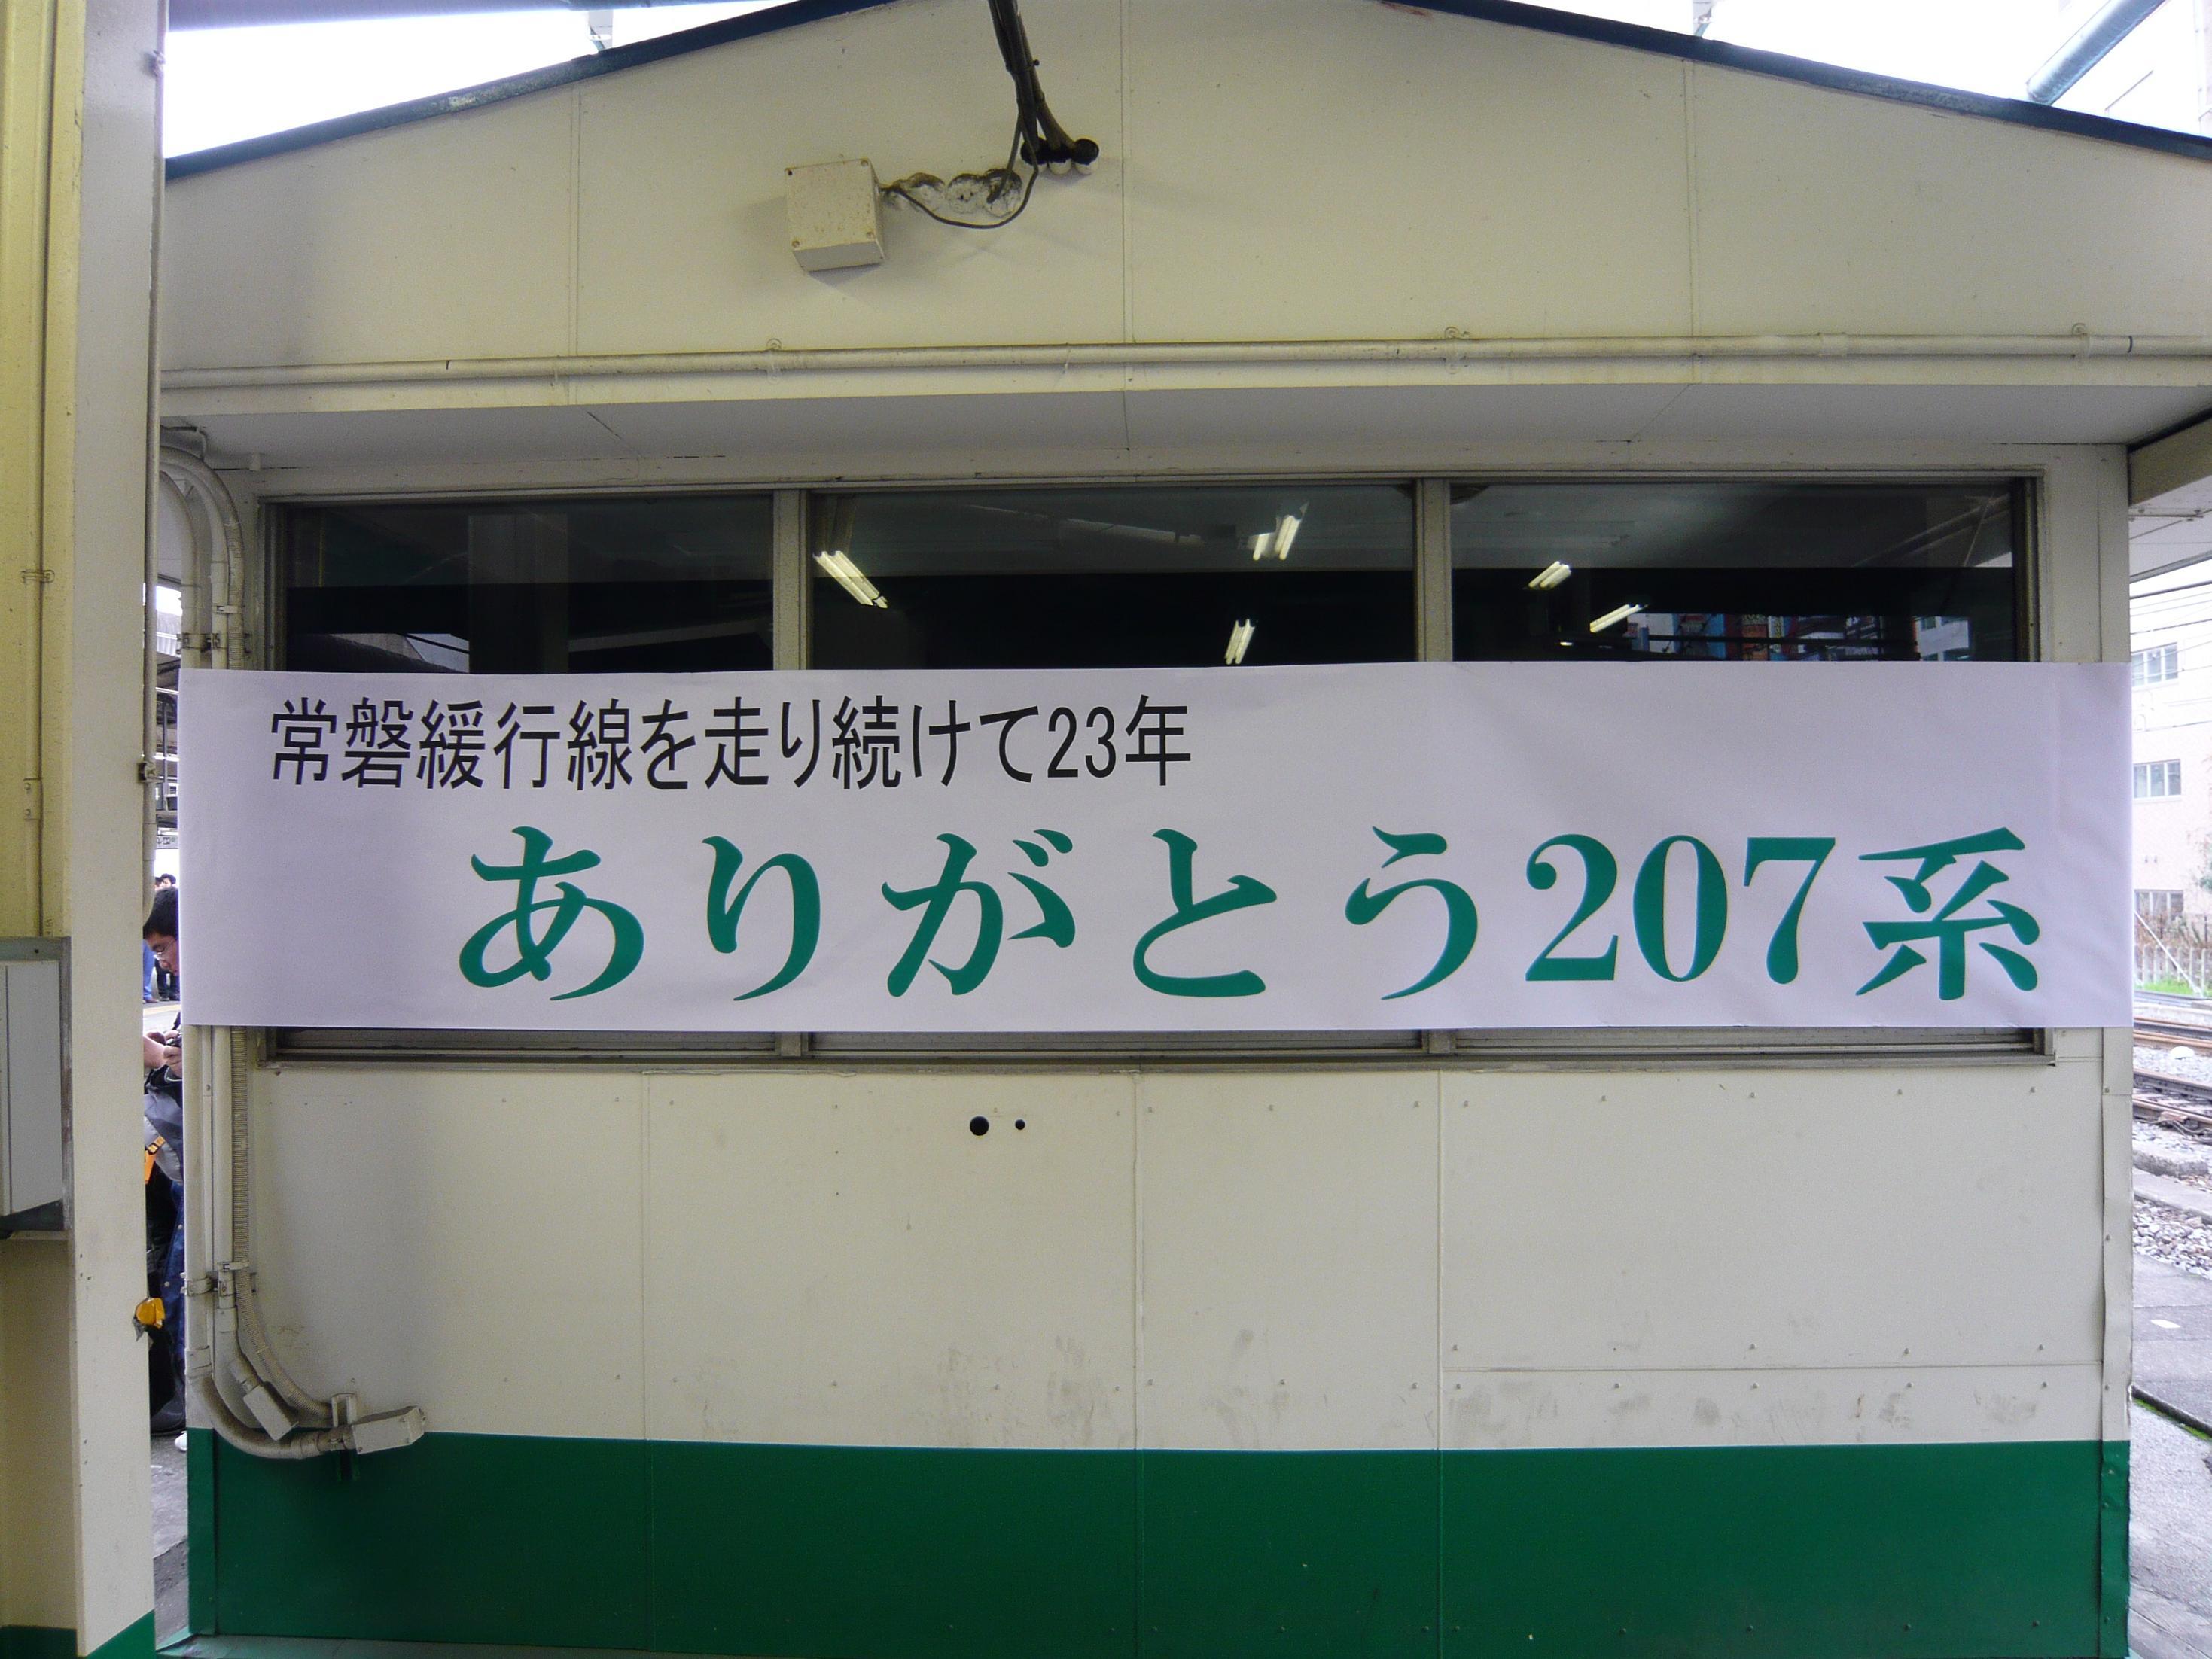 P1010760-2.JPG